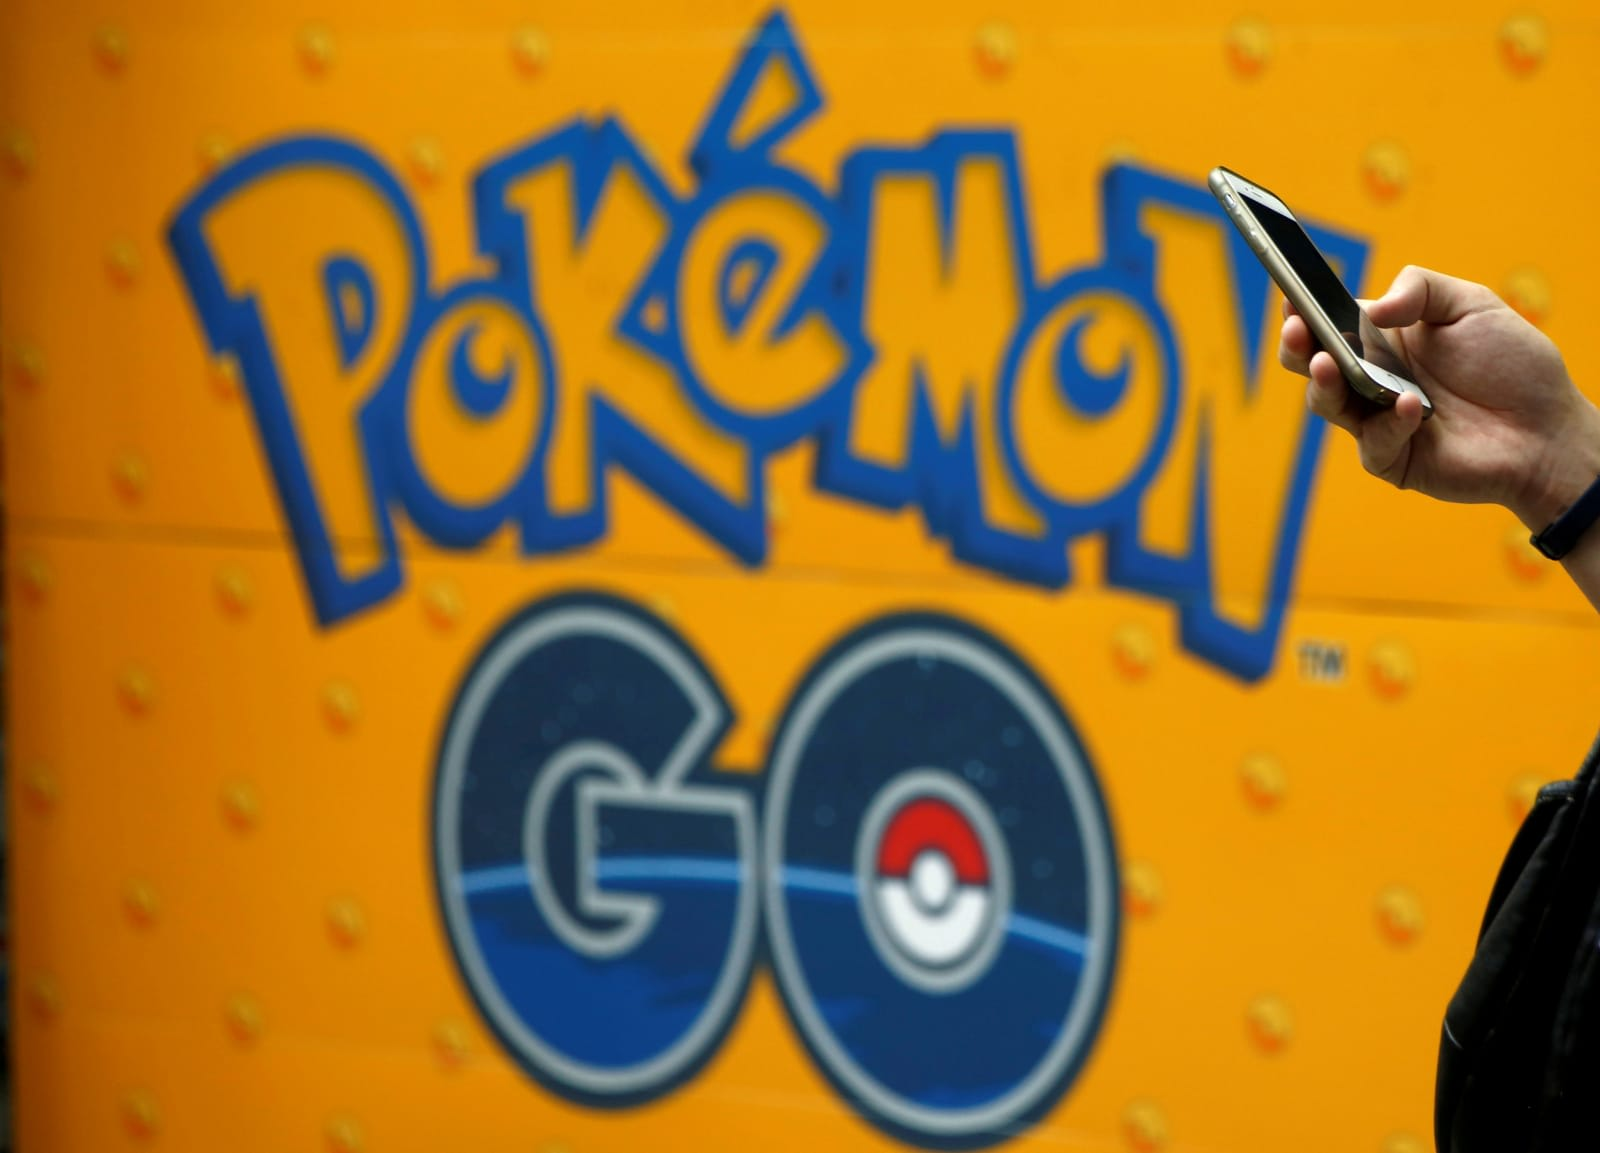 'Pokémon Go' creator buys hybrid board game company Sensible Object